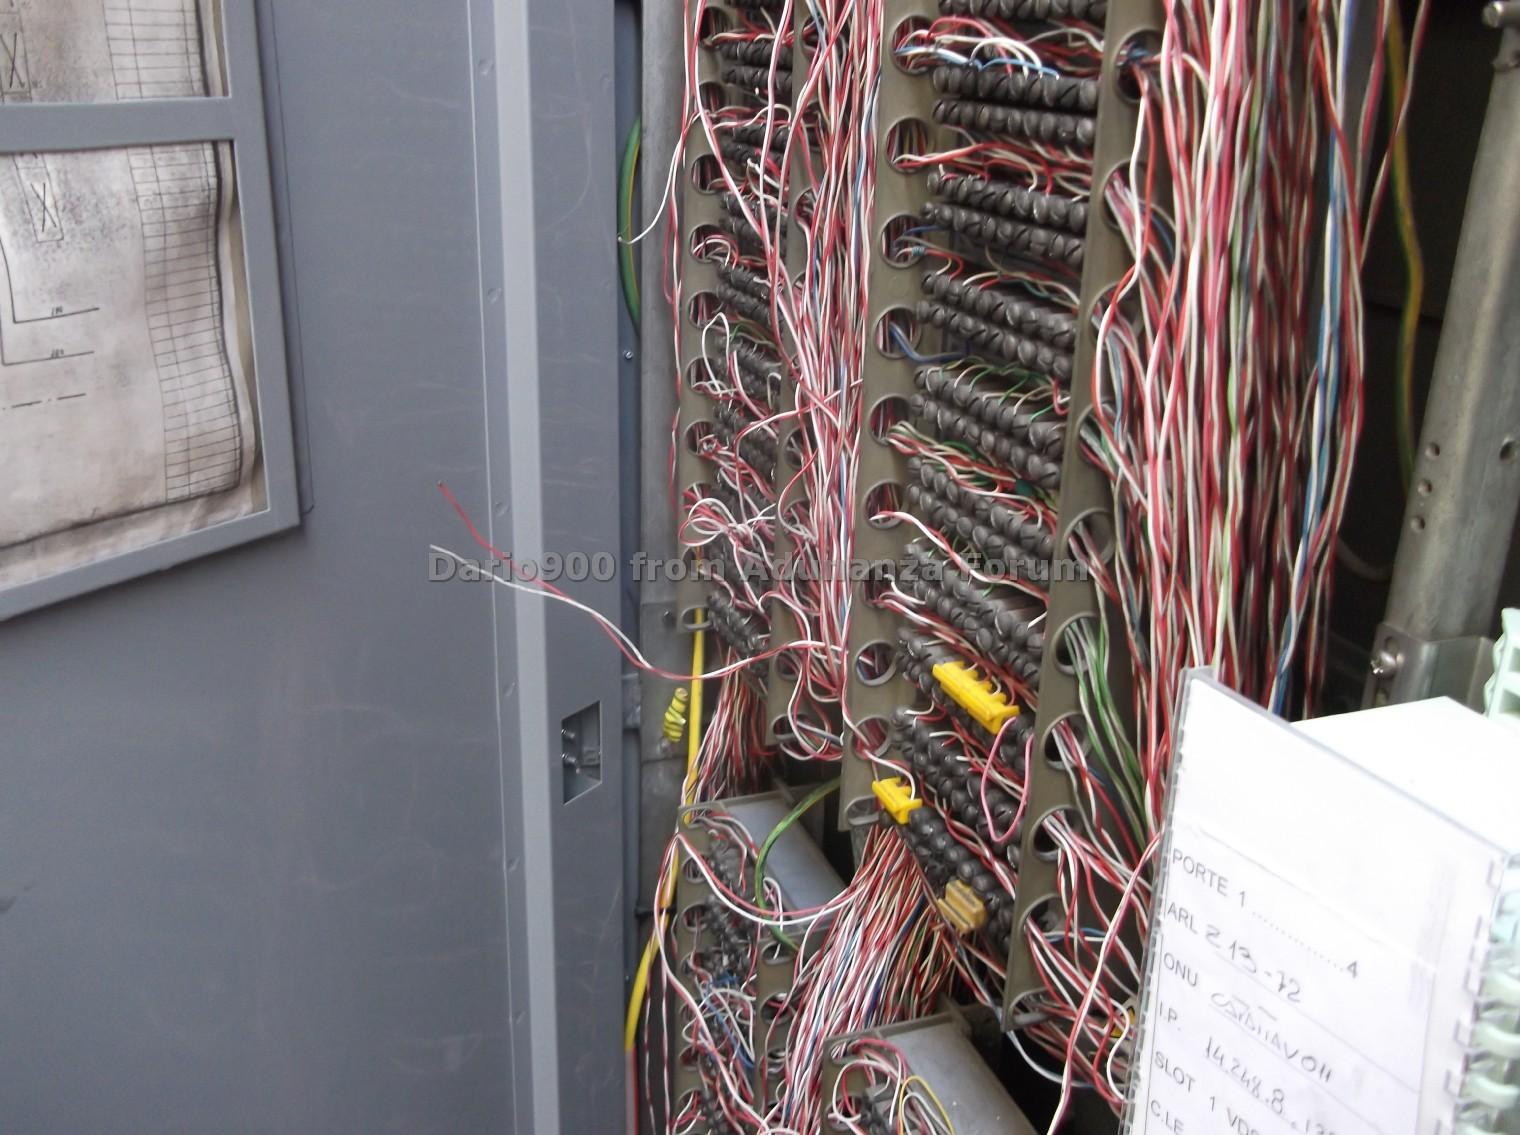 Cabina Armadio Telecom : Fotostoria di una attivazione vdsl telecom banda larga aduforum